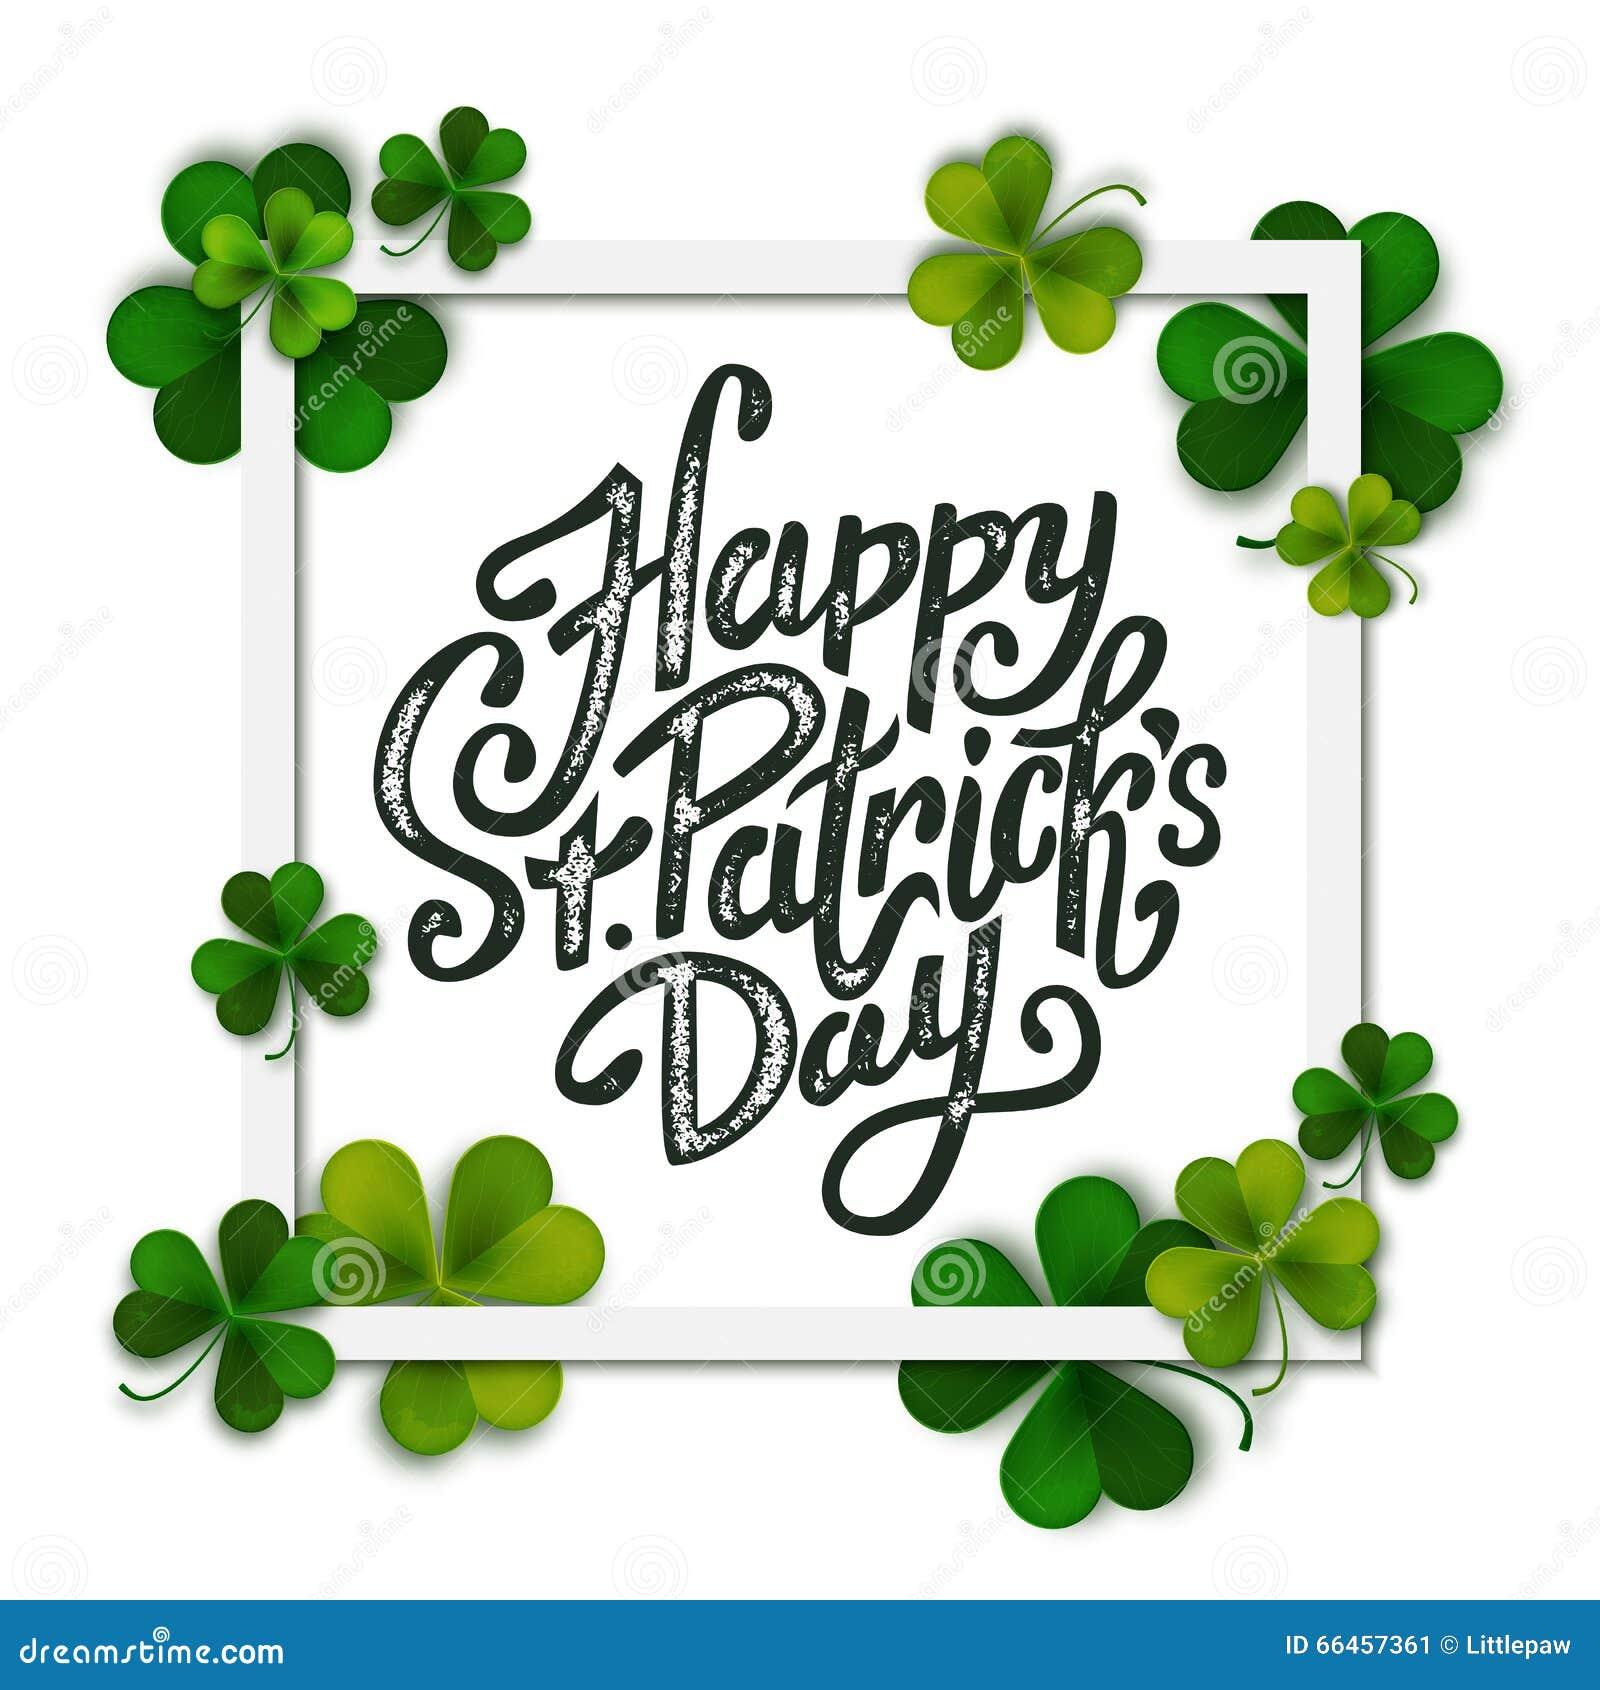 Happy Saint Patrick s day handwritten message, brush pen lettering on green shamrock background in square frame